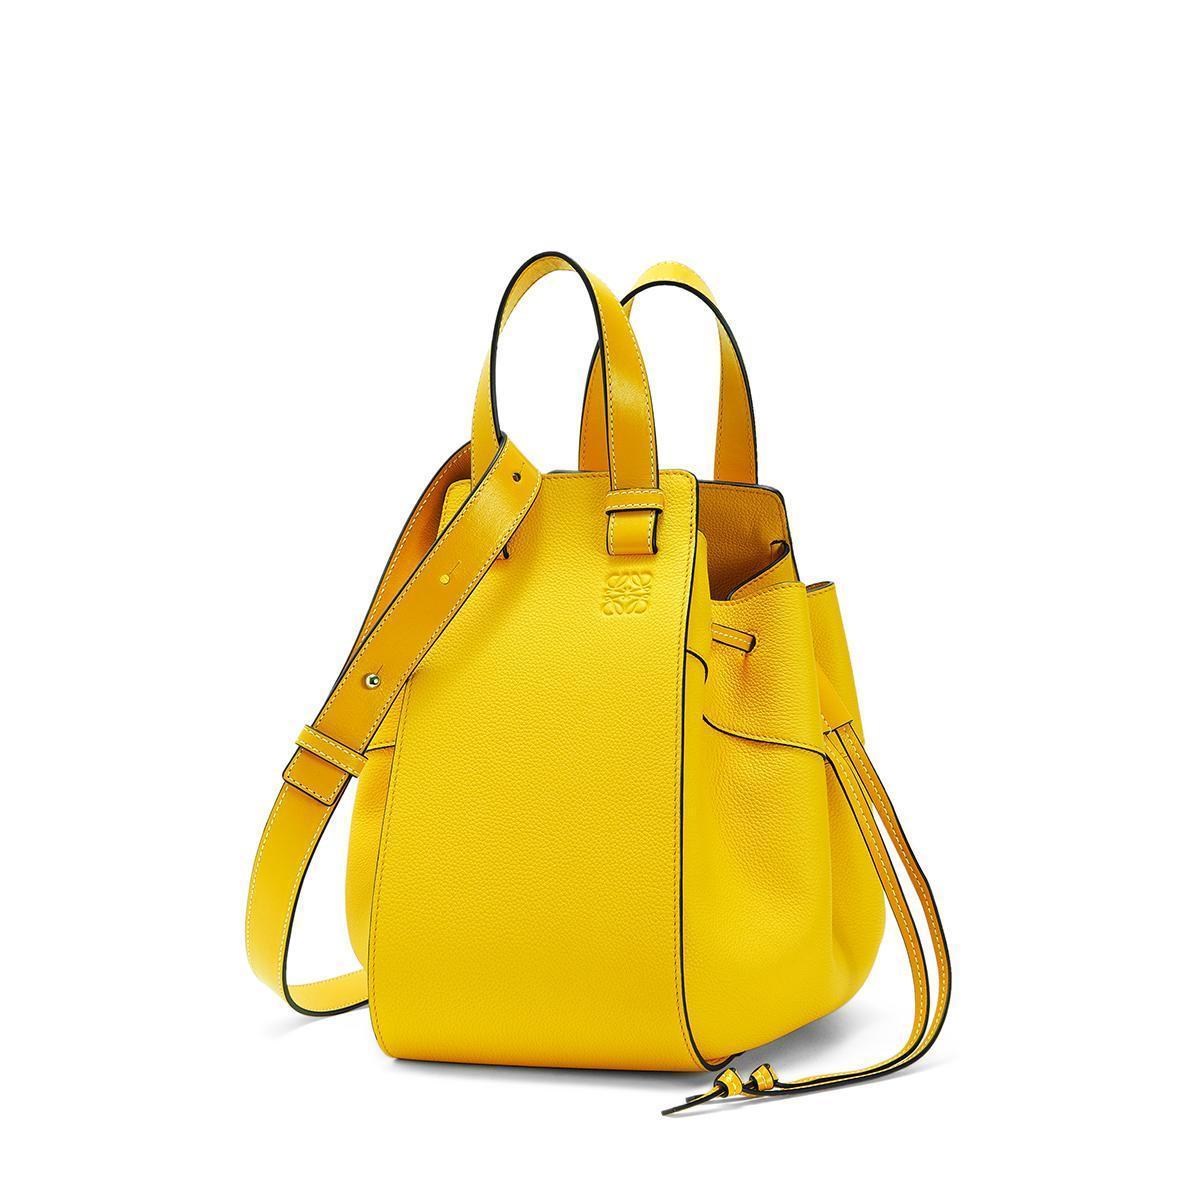 Hammock鮮黃色小牛皮肩背提包。NT$63,000。(LOEWE提供)